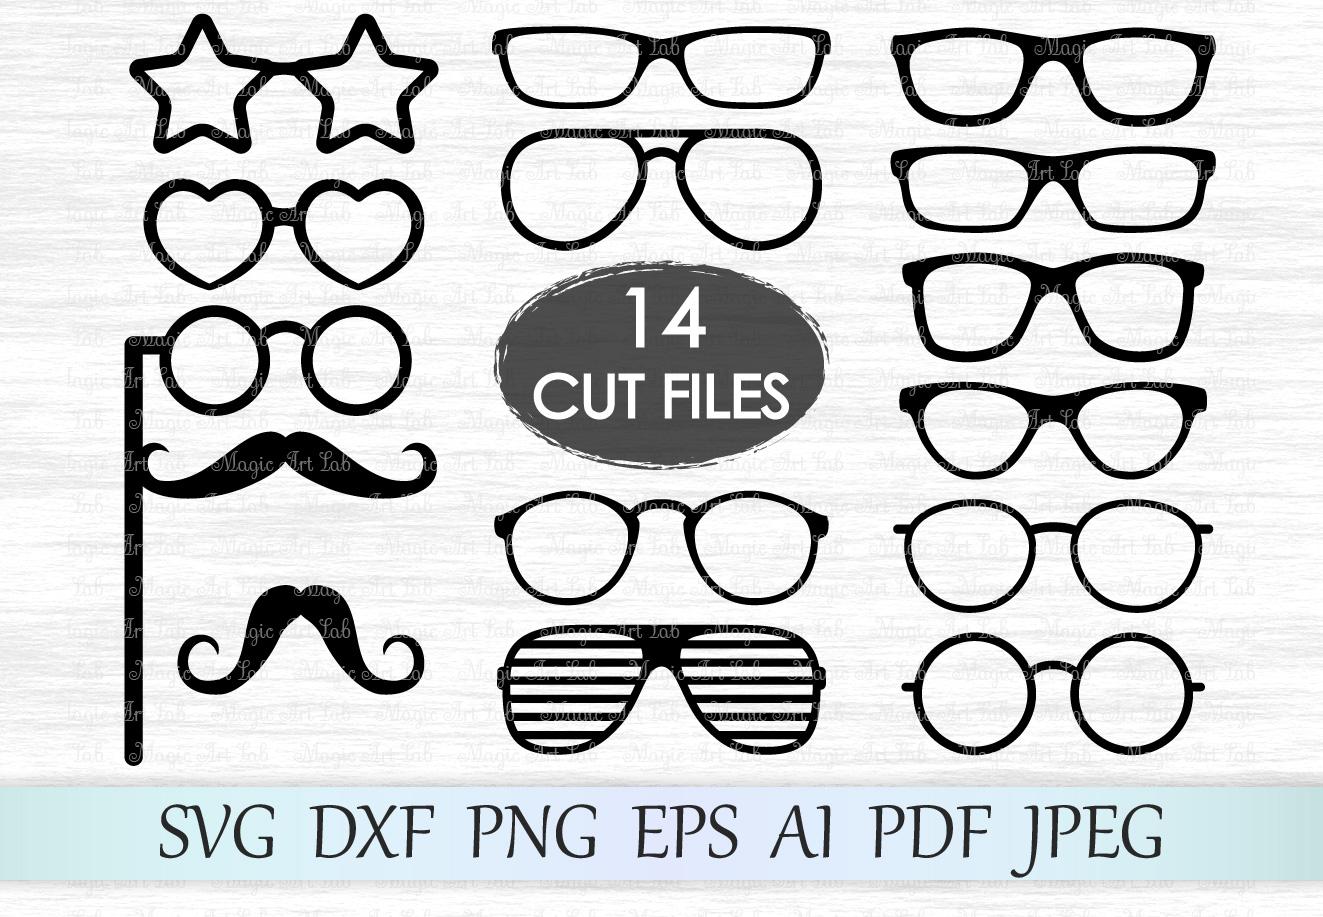 Glasses svg, Glasses clipart, Glasses svg file, Eyeglasses photobooth, Hipster glasses Svg, Glasses cut files, Party props, Hipster design example image 1